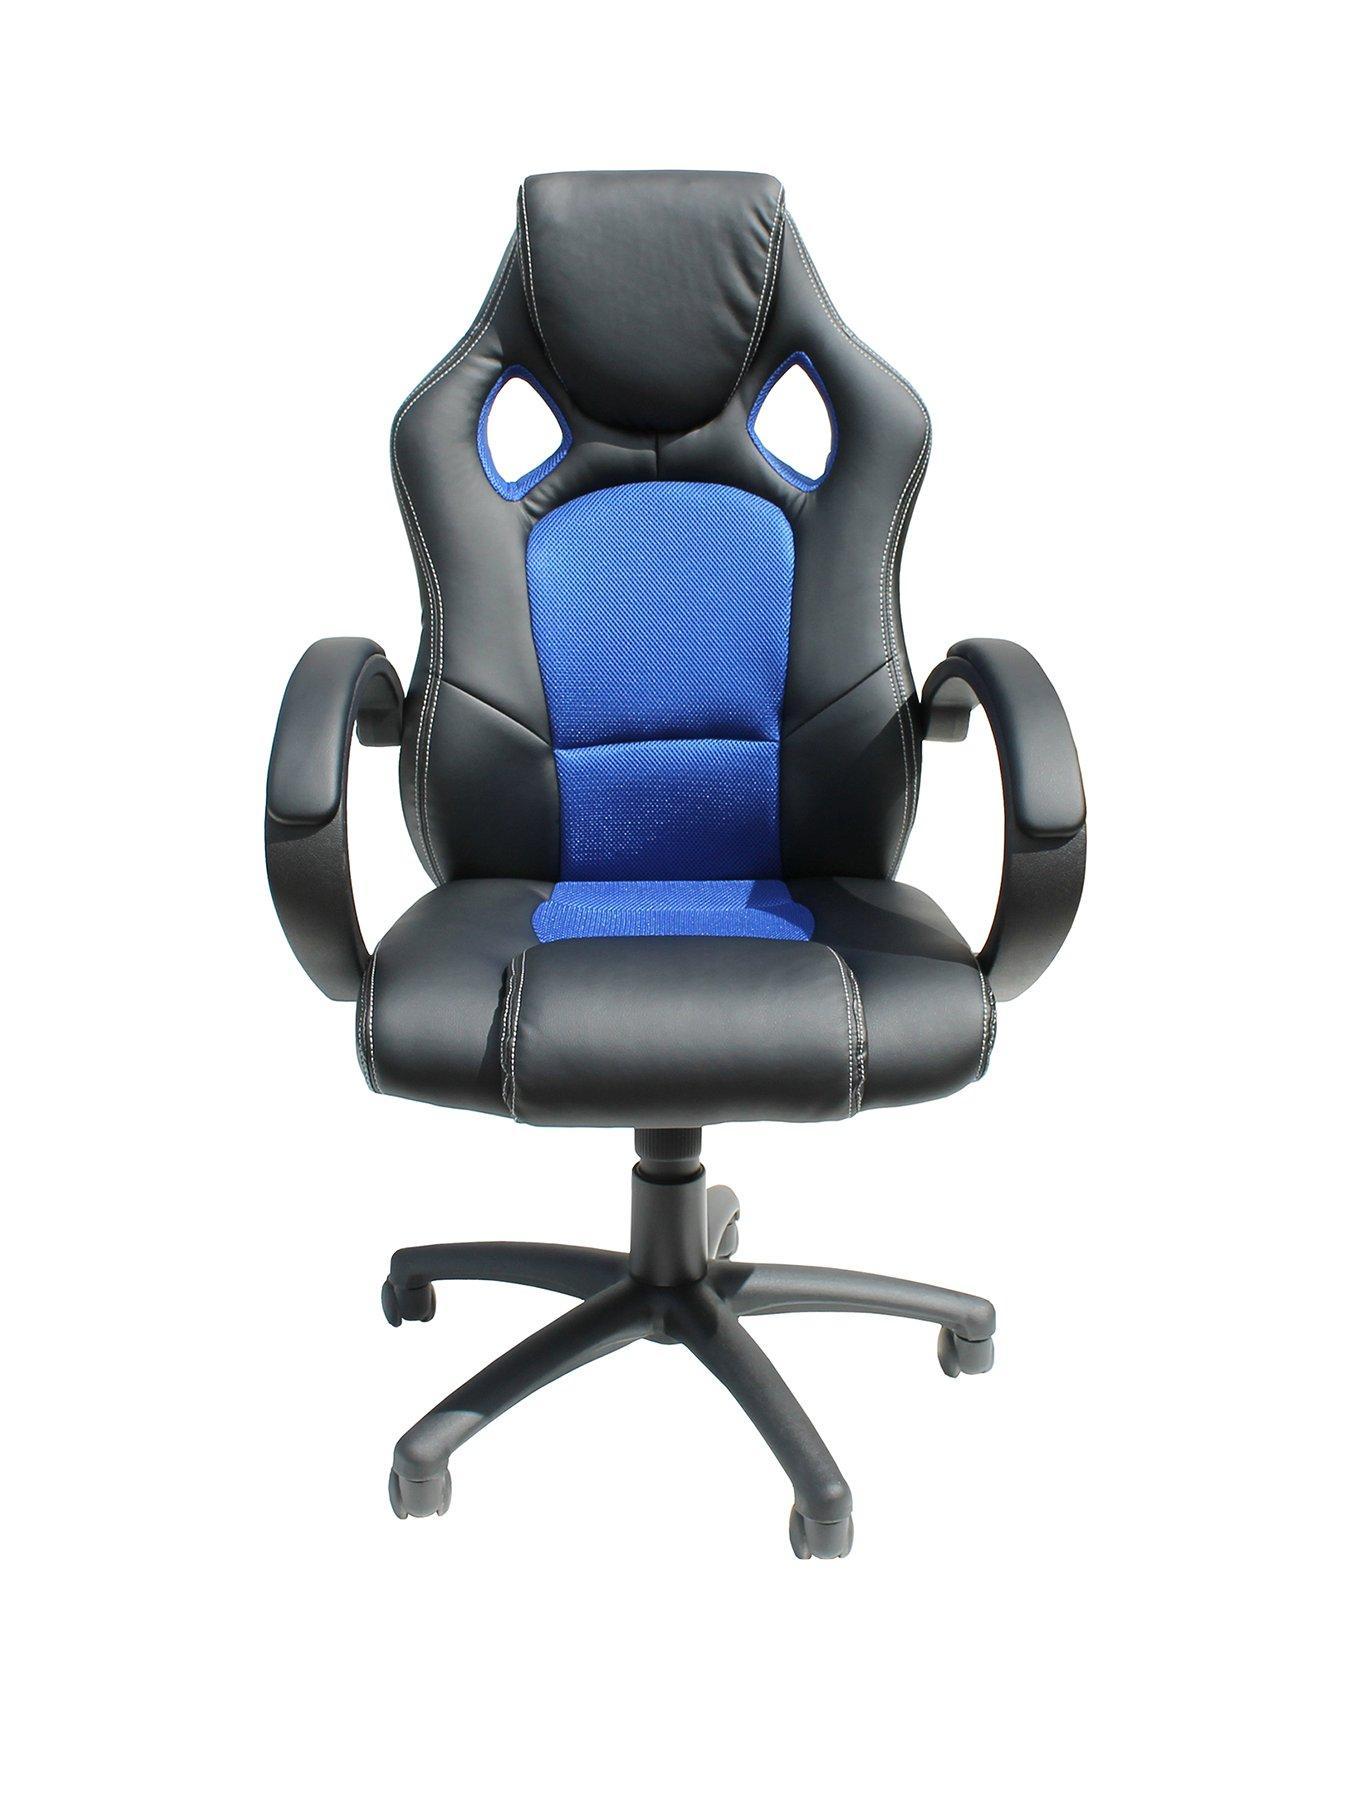 office chairs uk recliner chair covers walmart home garden www very co alphason jensen black blue